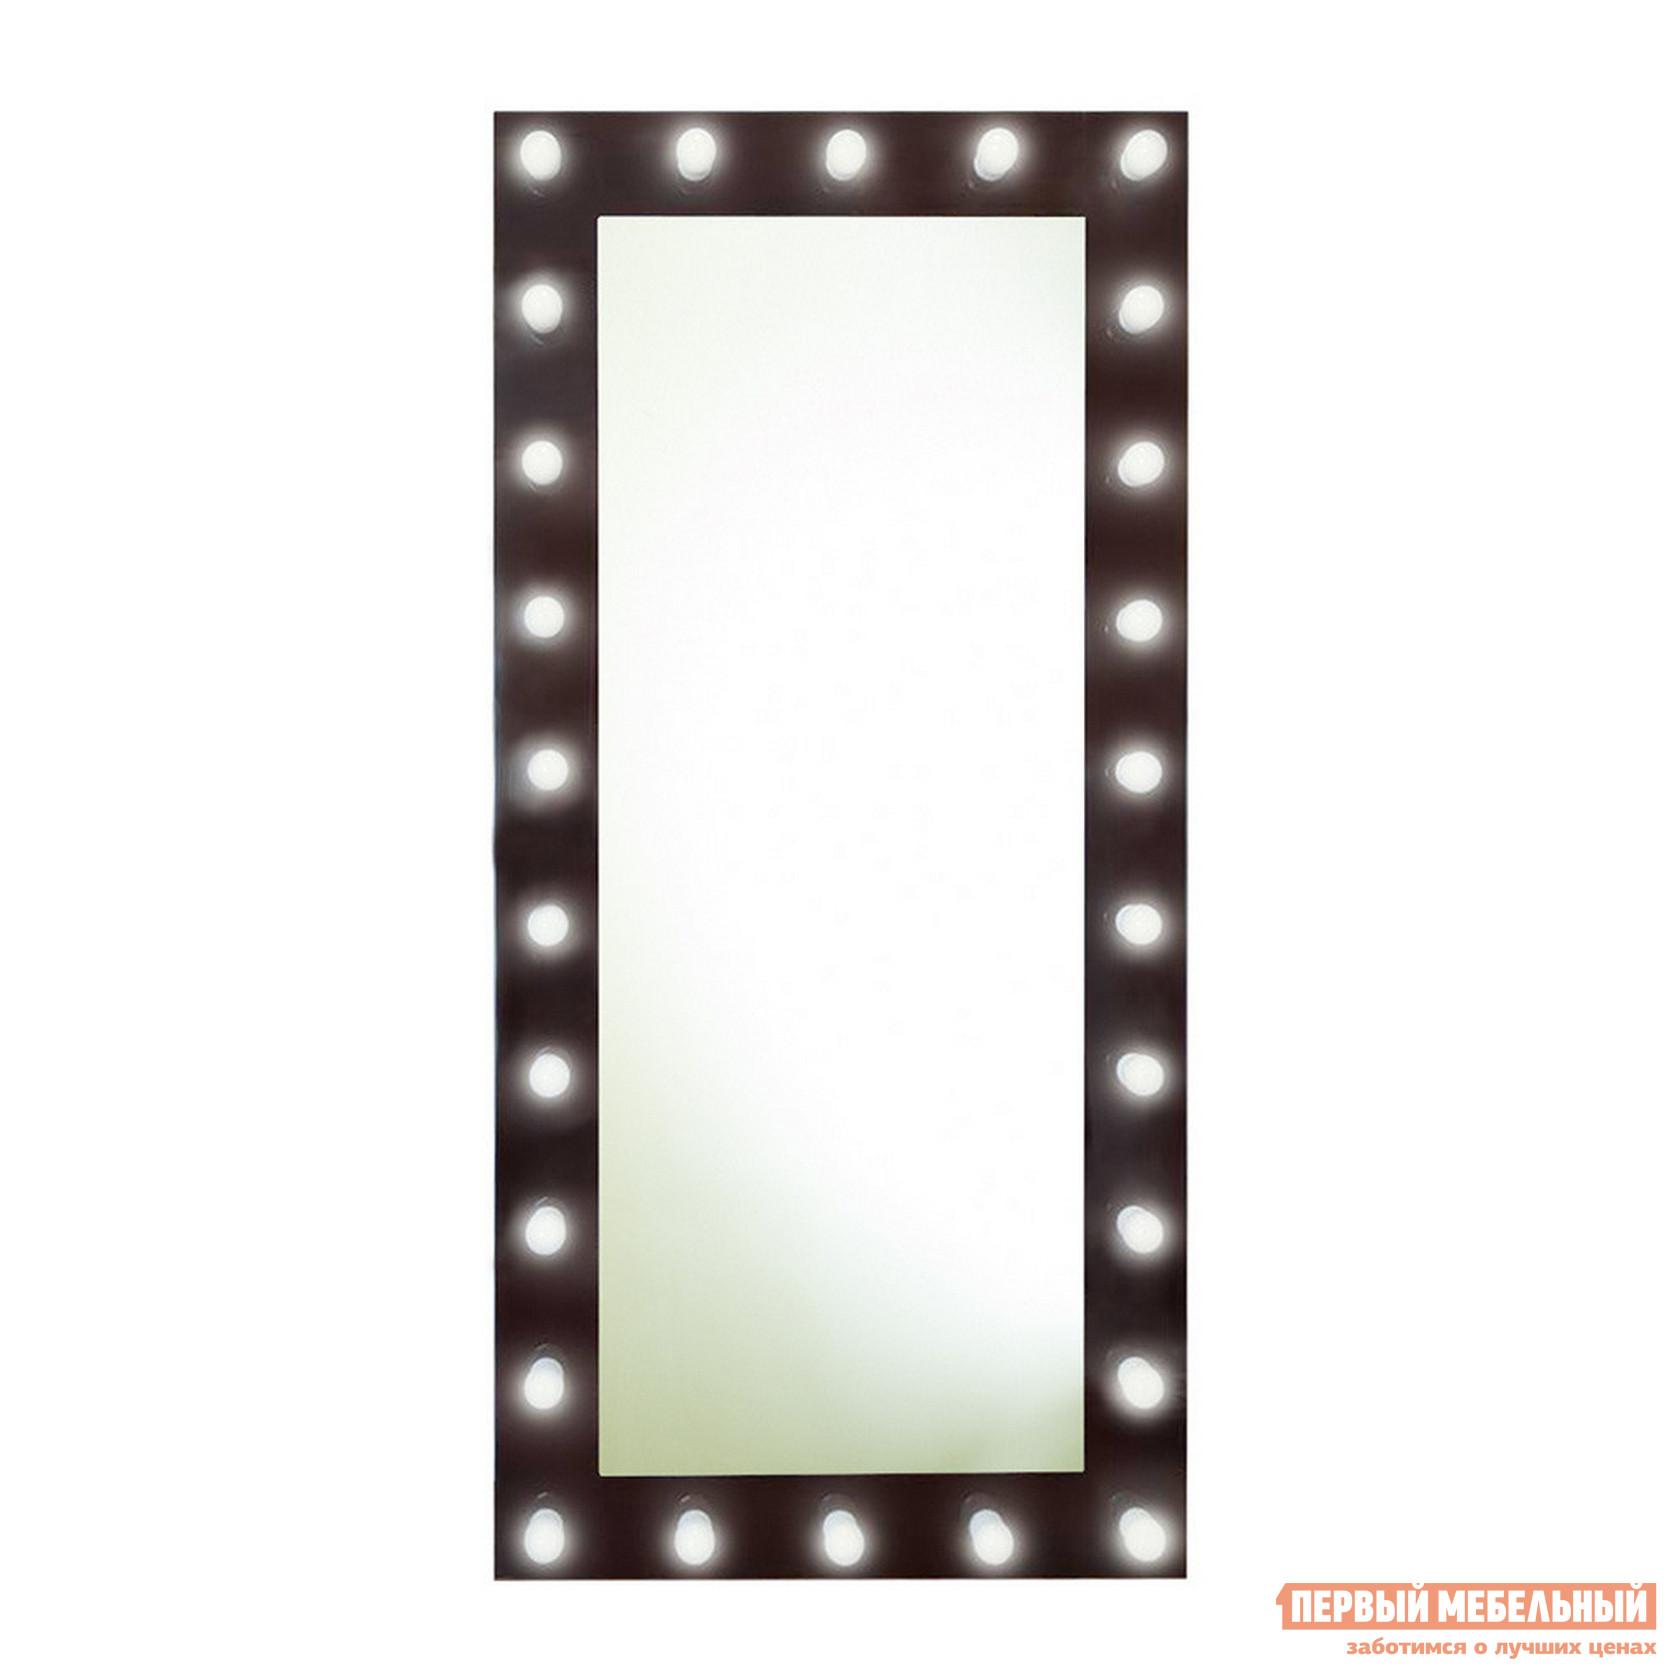 Напольное зеркало Континент Зеркало ЗГП21